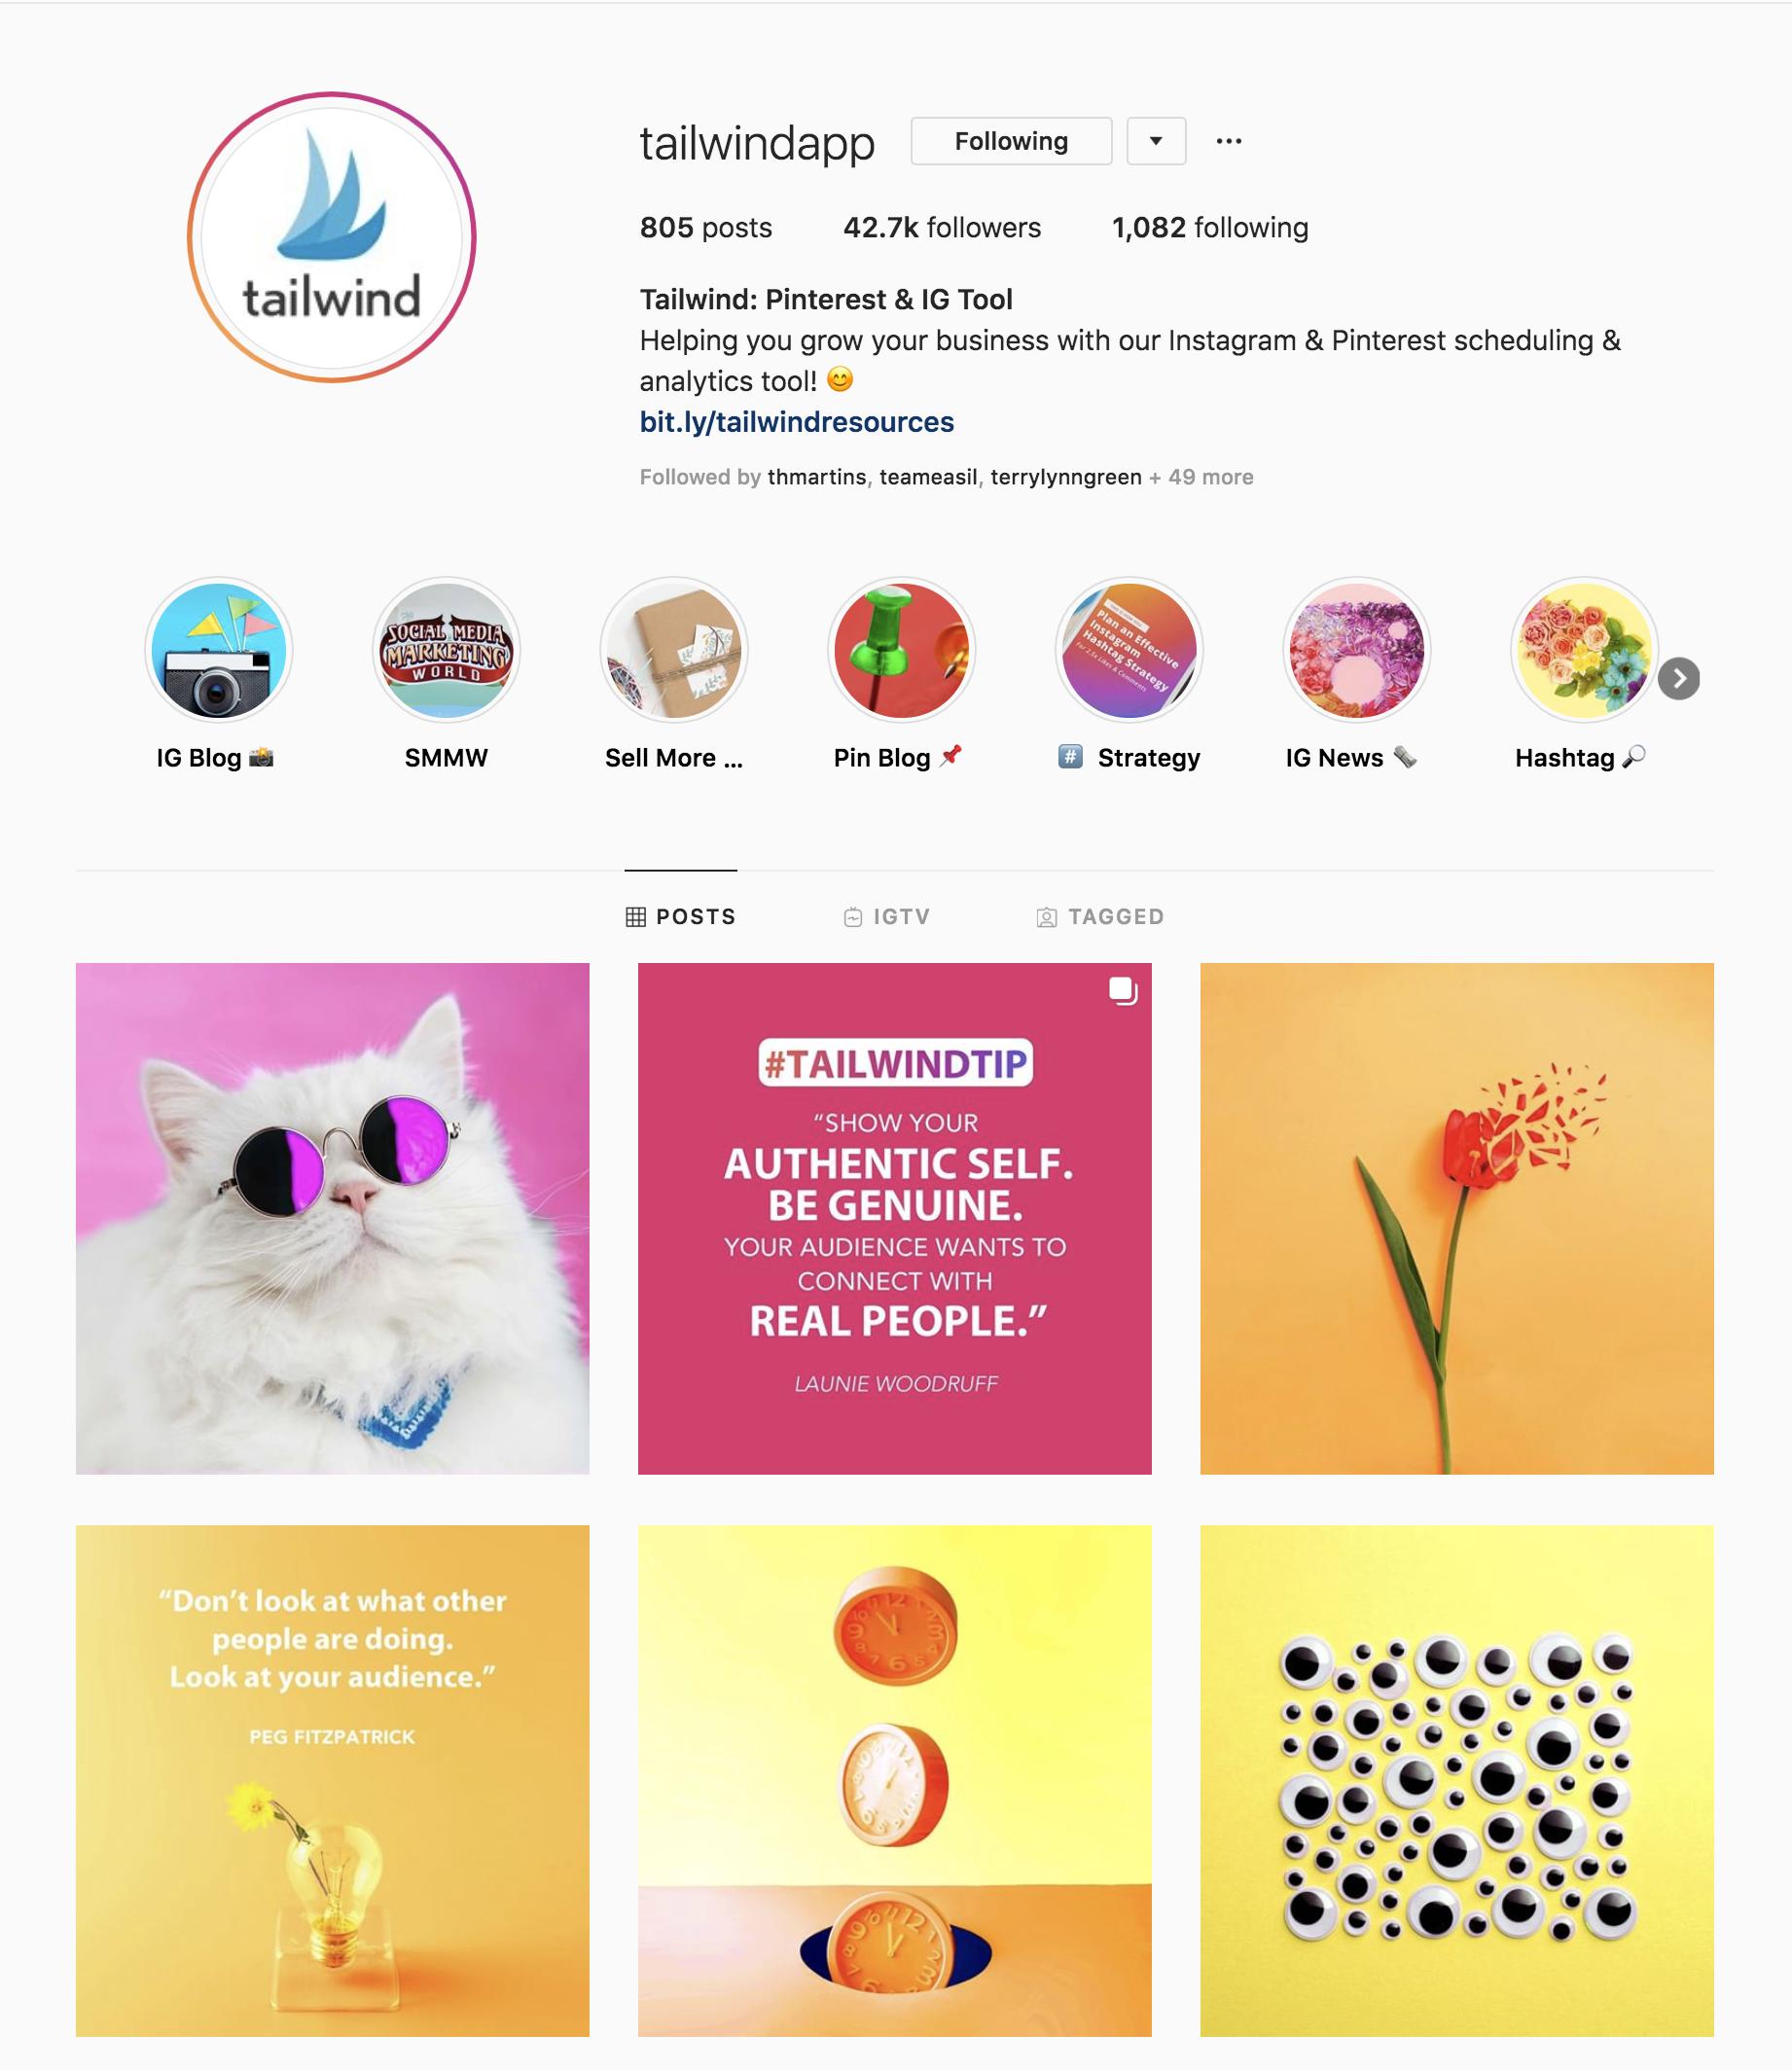 Tailwind Instagram Account